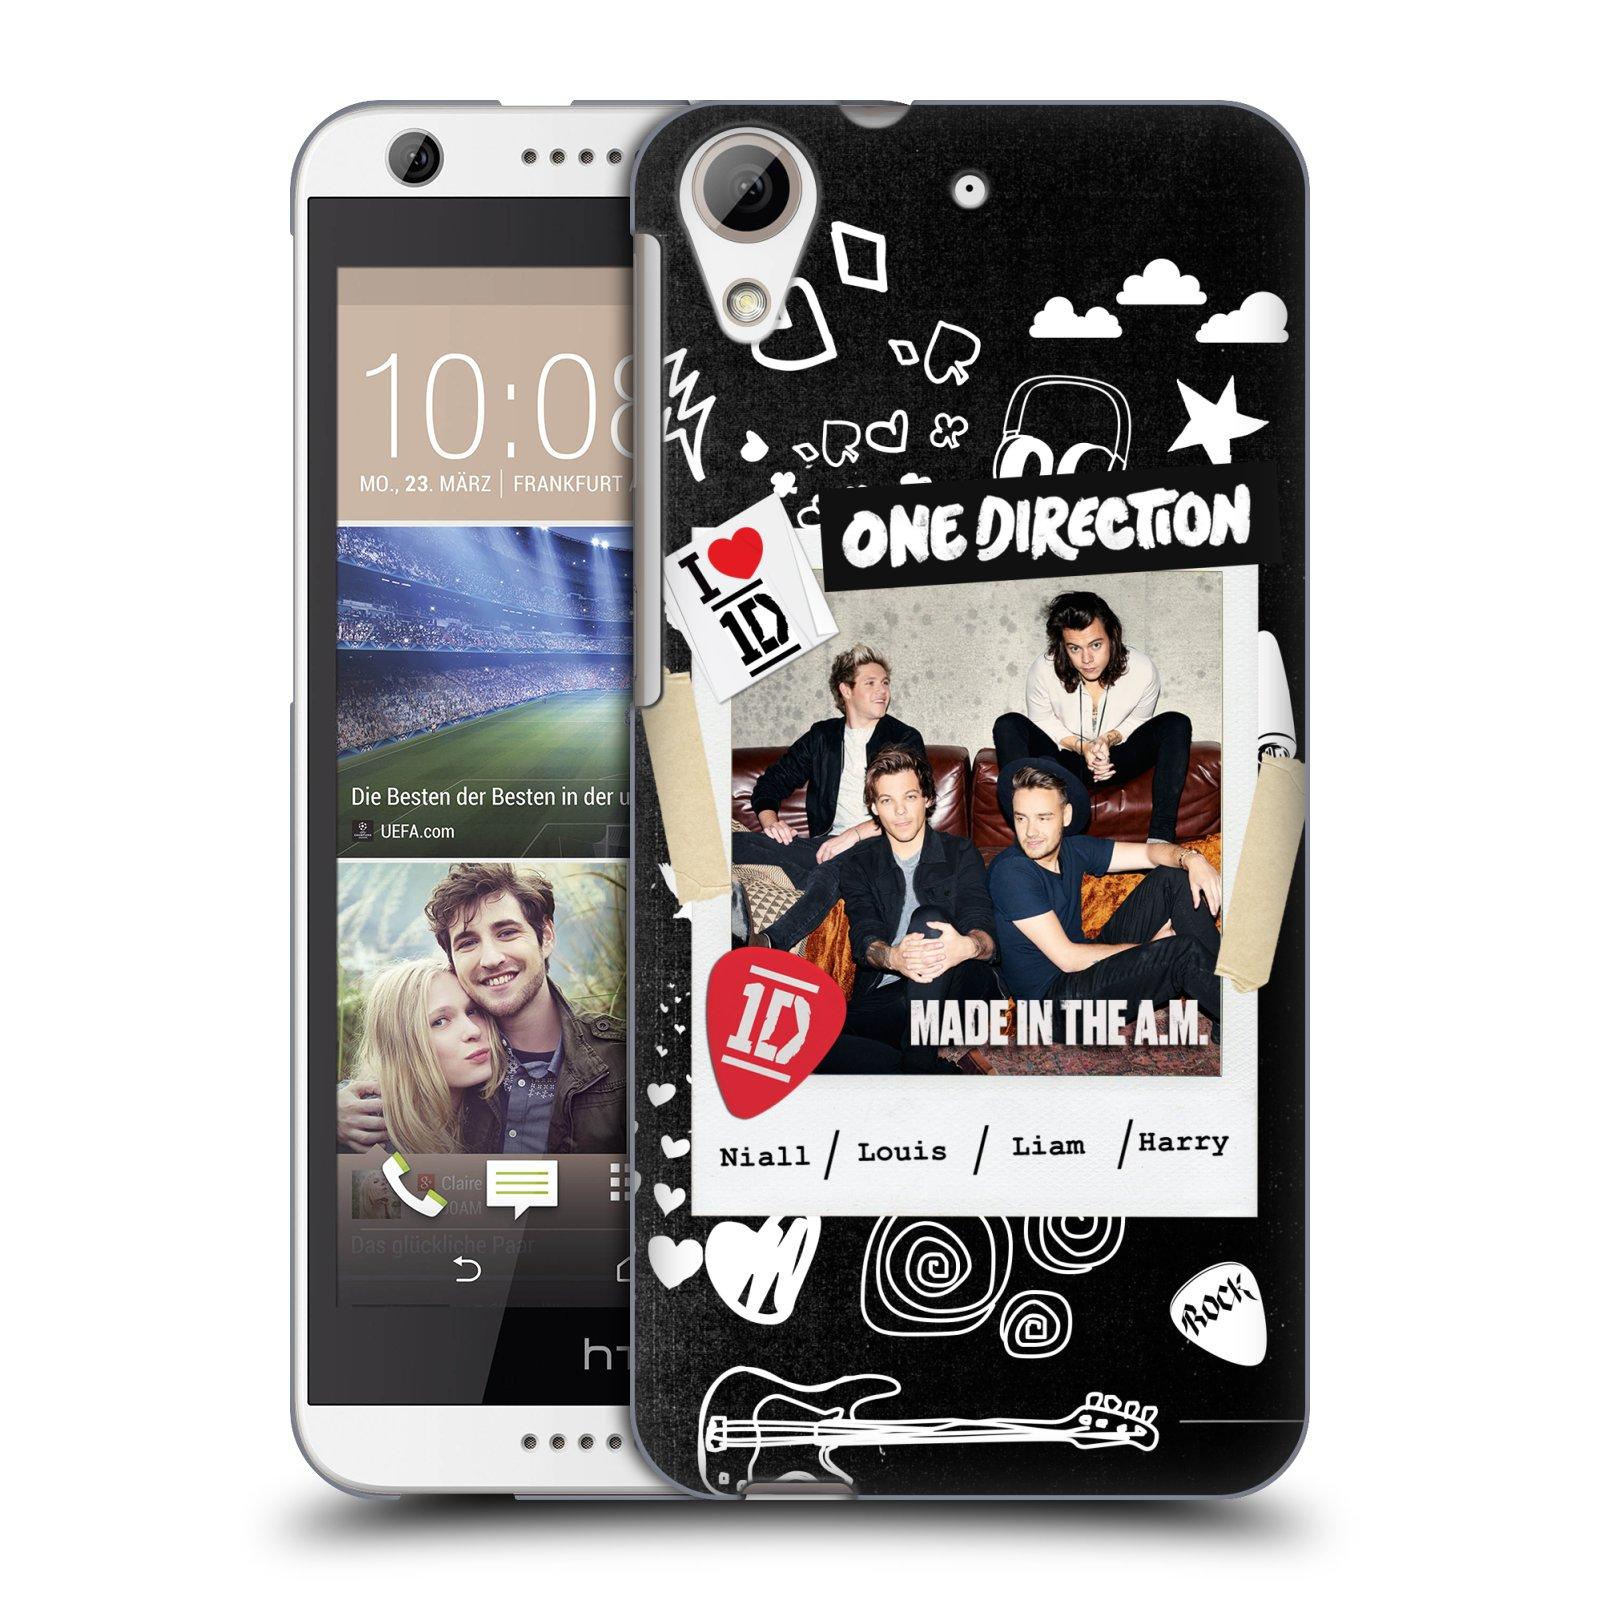 Plastové pouzdro na mobil HTC Desire 626 / 626G HEAD CASE One Direction - S kytárou (Kryt či obal One Direction Official na mobilní telefon HTC Desire 626G Dual SIM a HTC Desire 626)